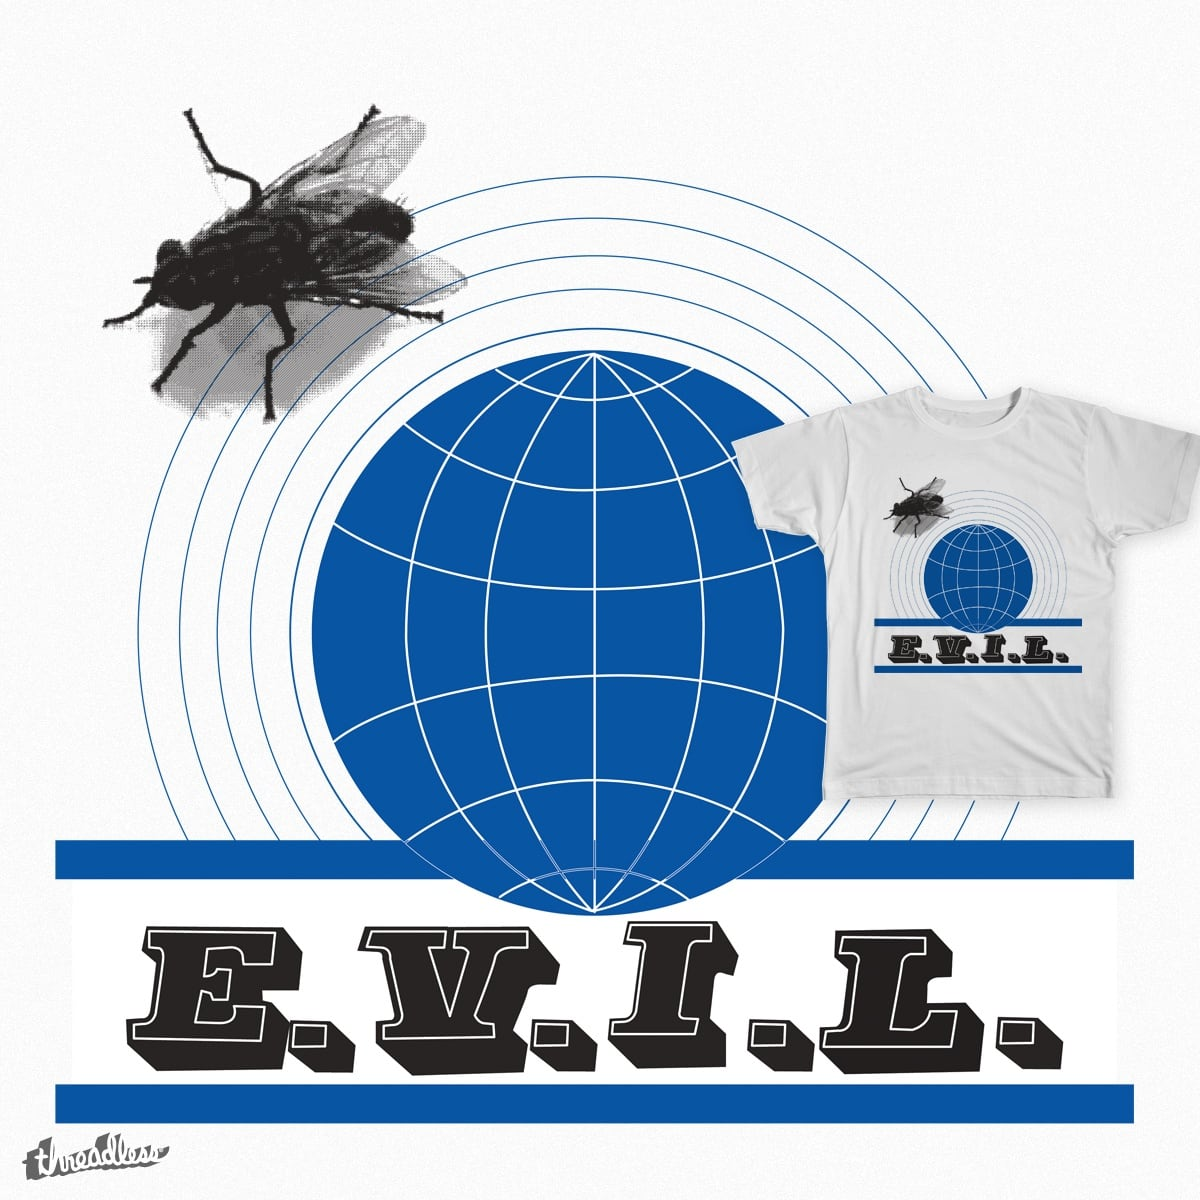 Fly from E.V.I.L. by SimonVine on Threadless